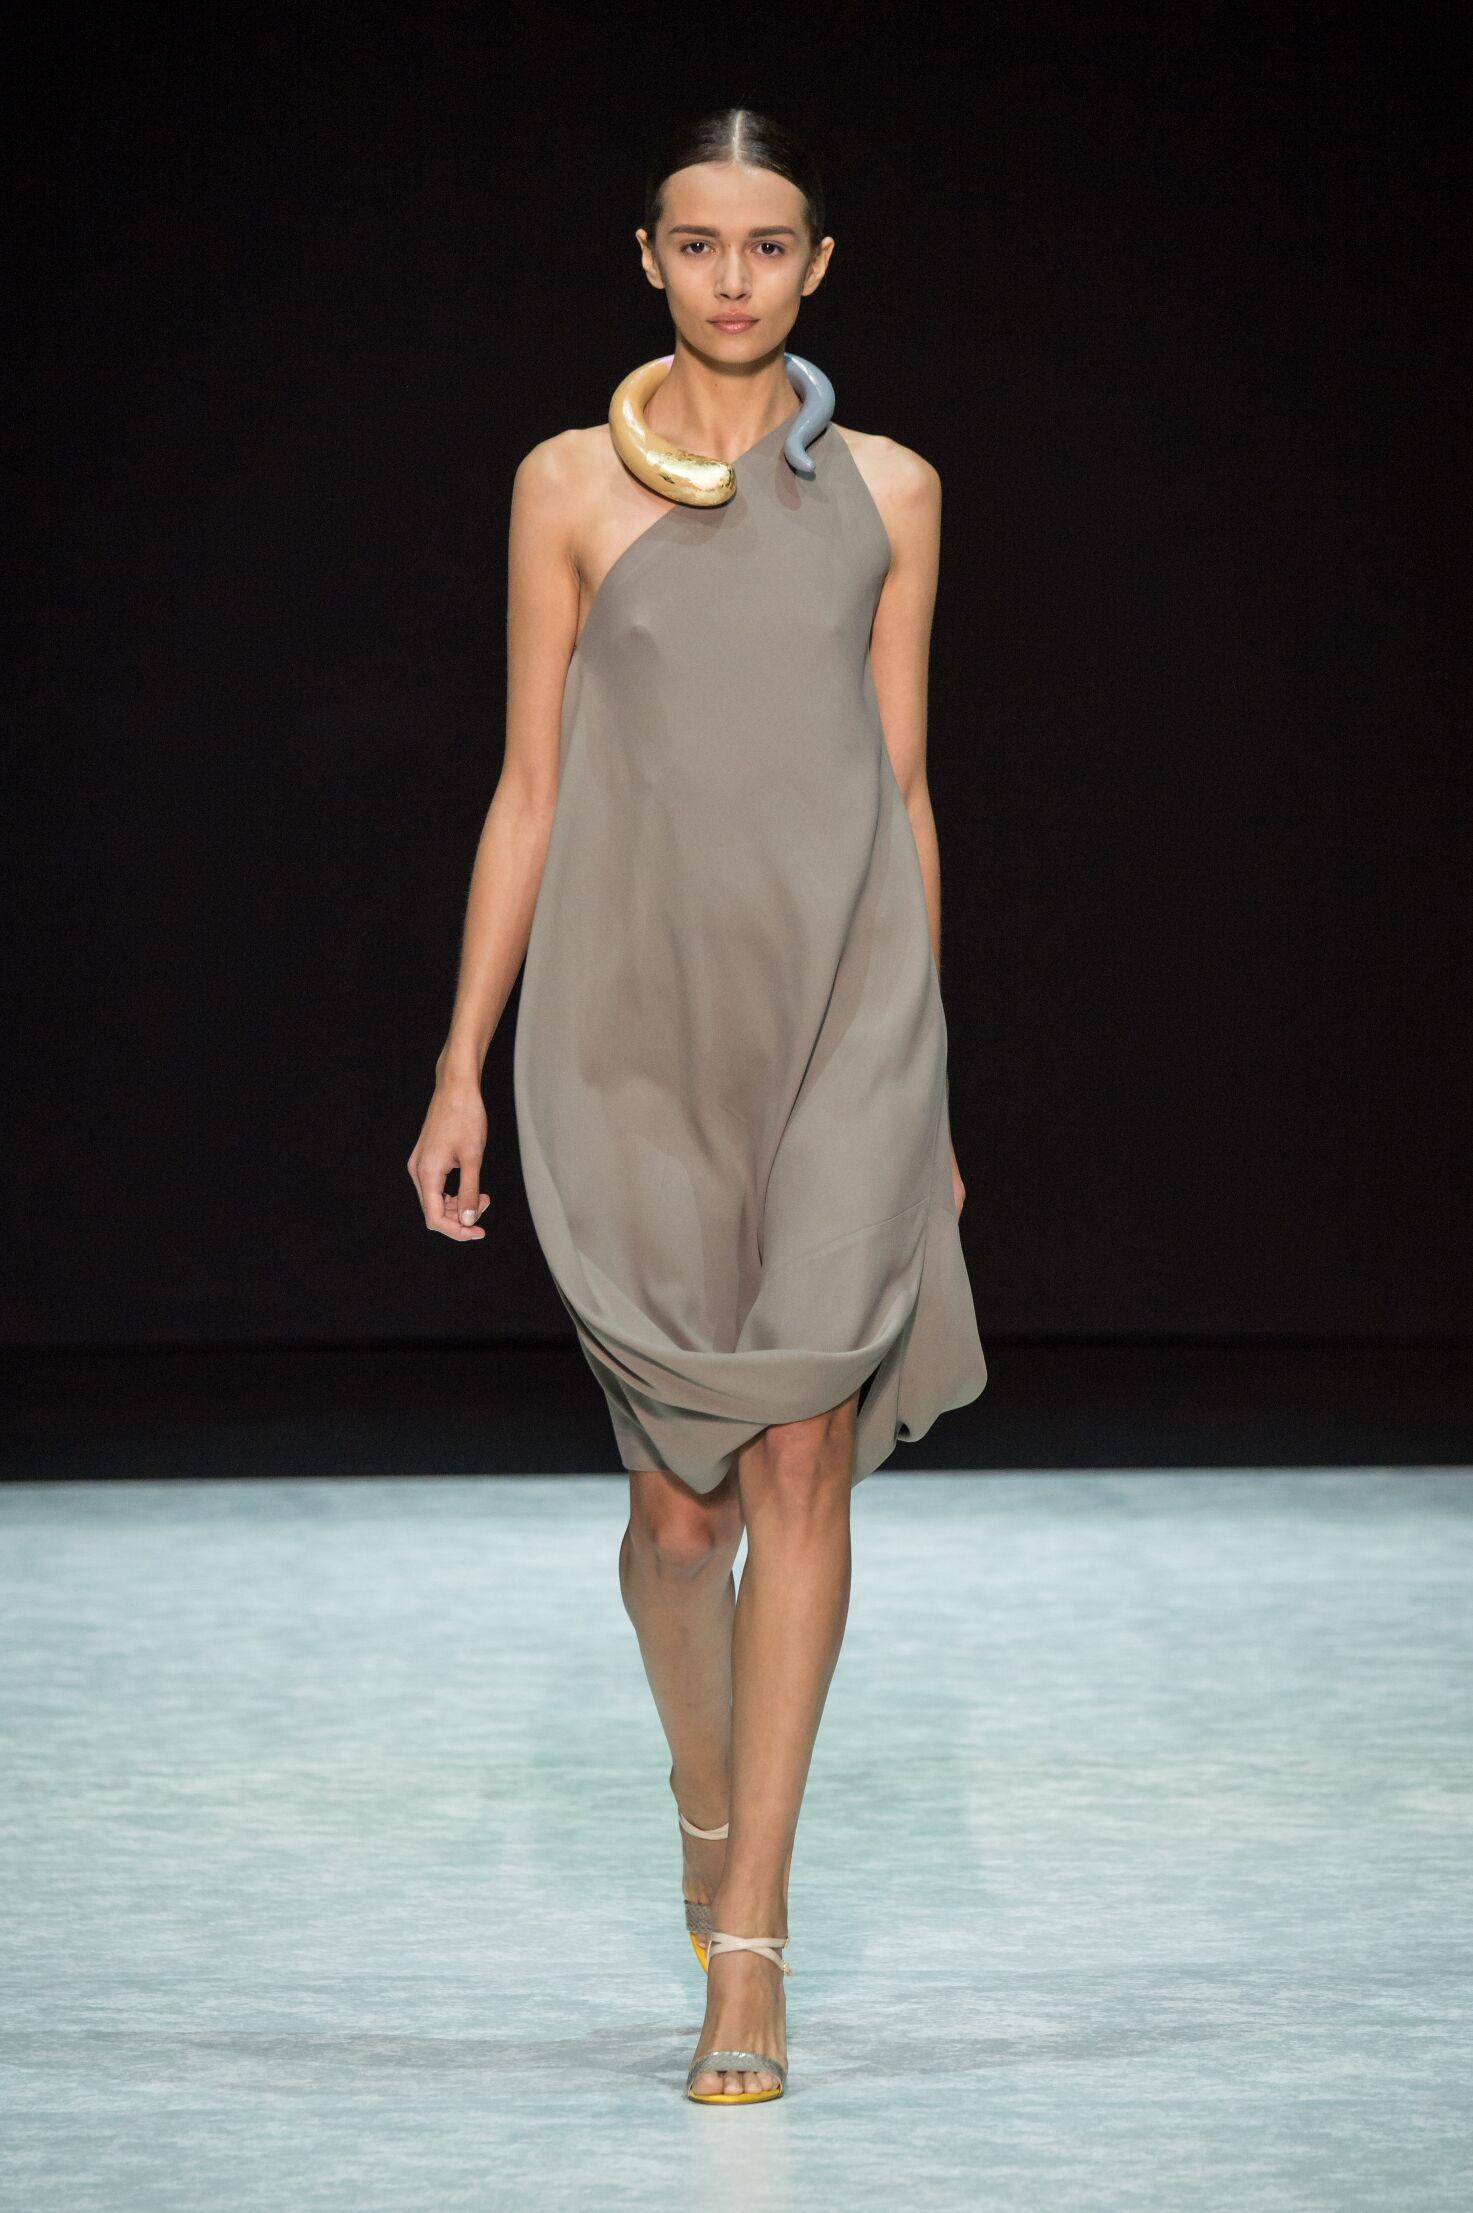 Fashion Woman Model Angelos Bratis Catwalk